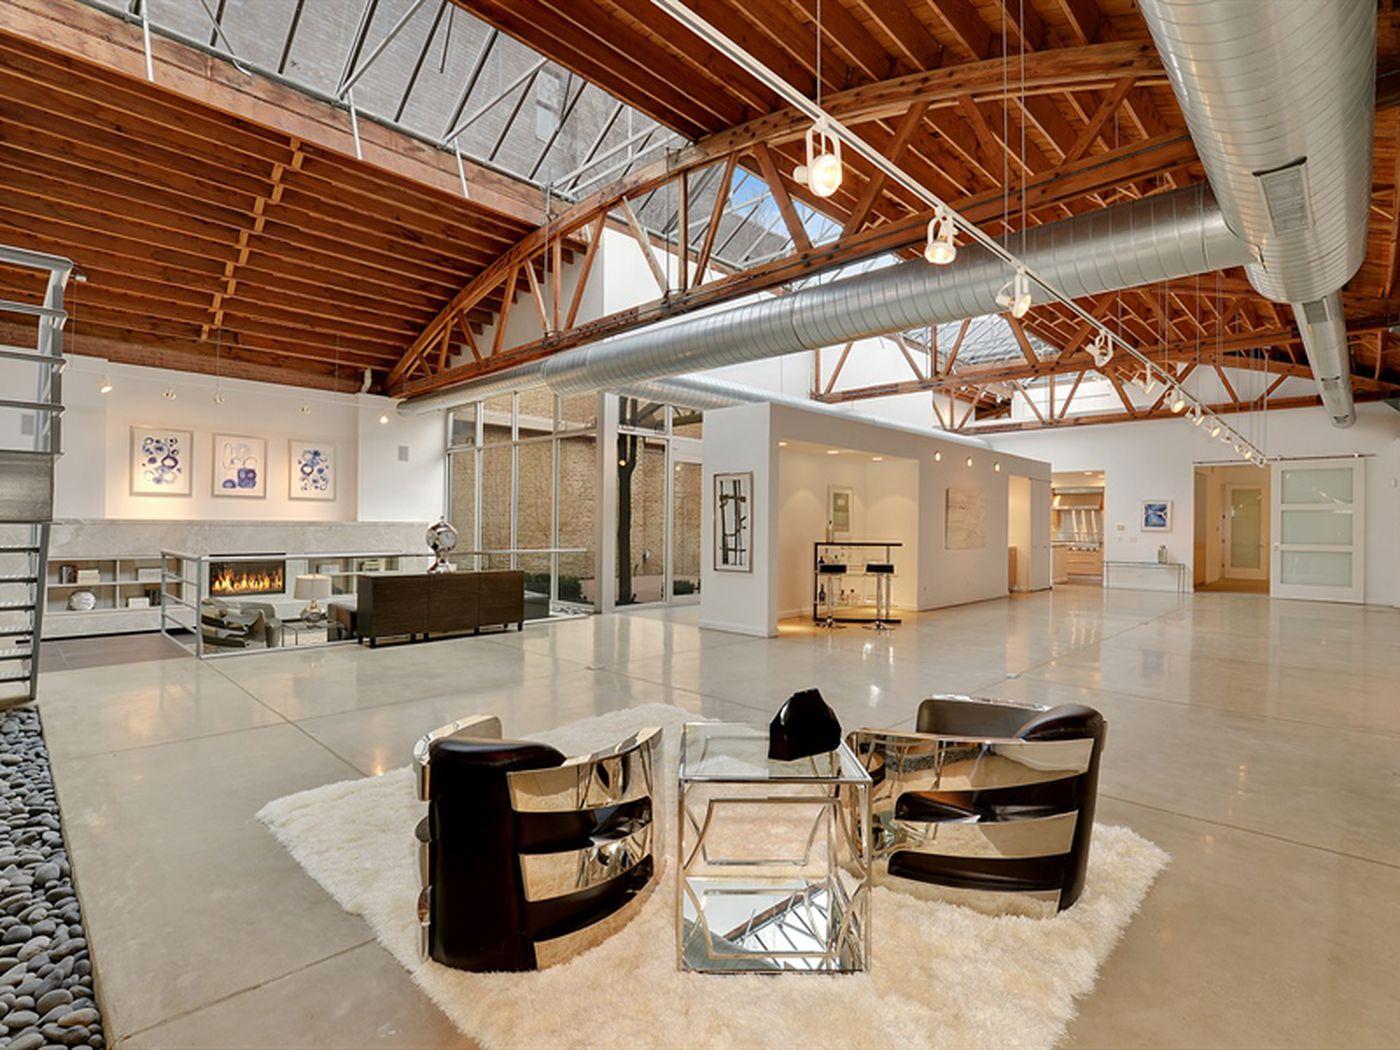 Architecture Services in Portage Park, Chicago